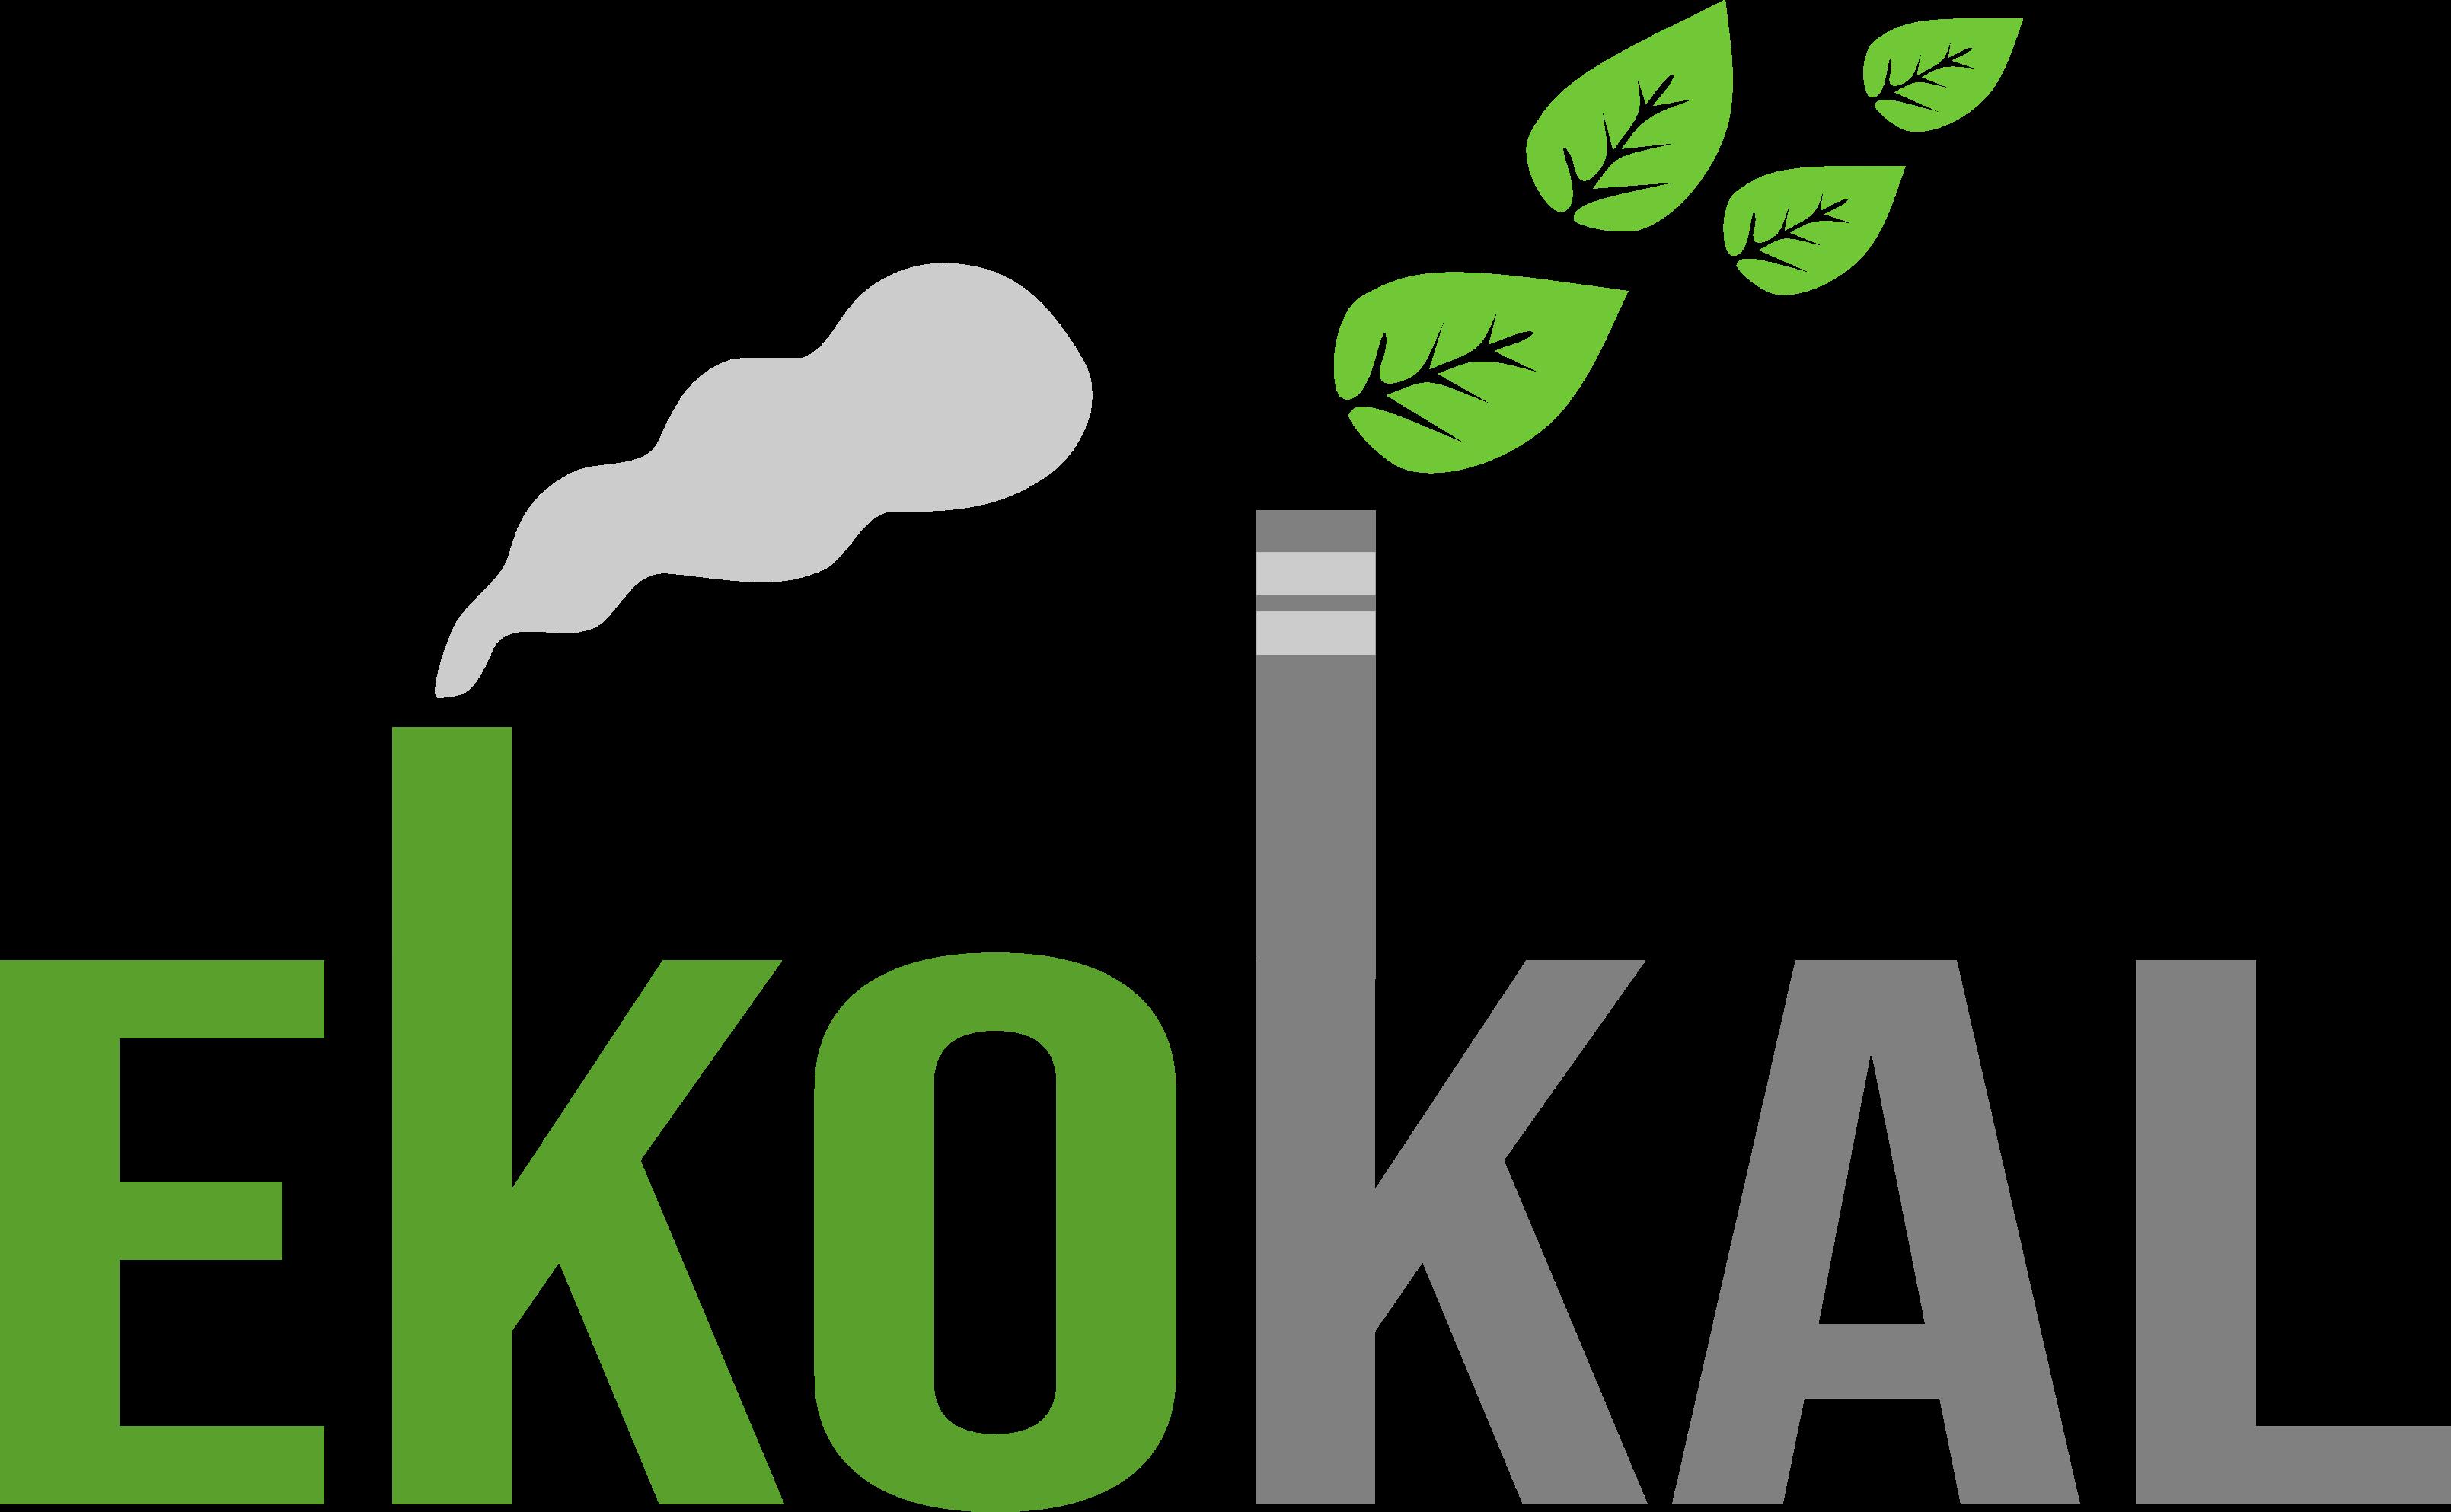 EKOKAL Tomasz Parys Logo